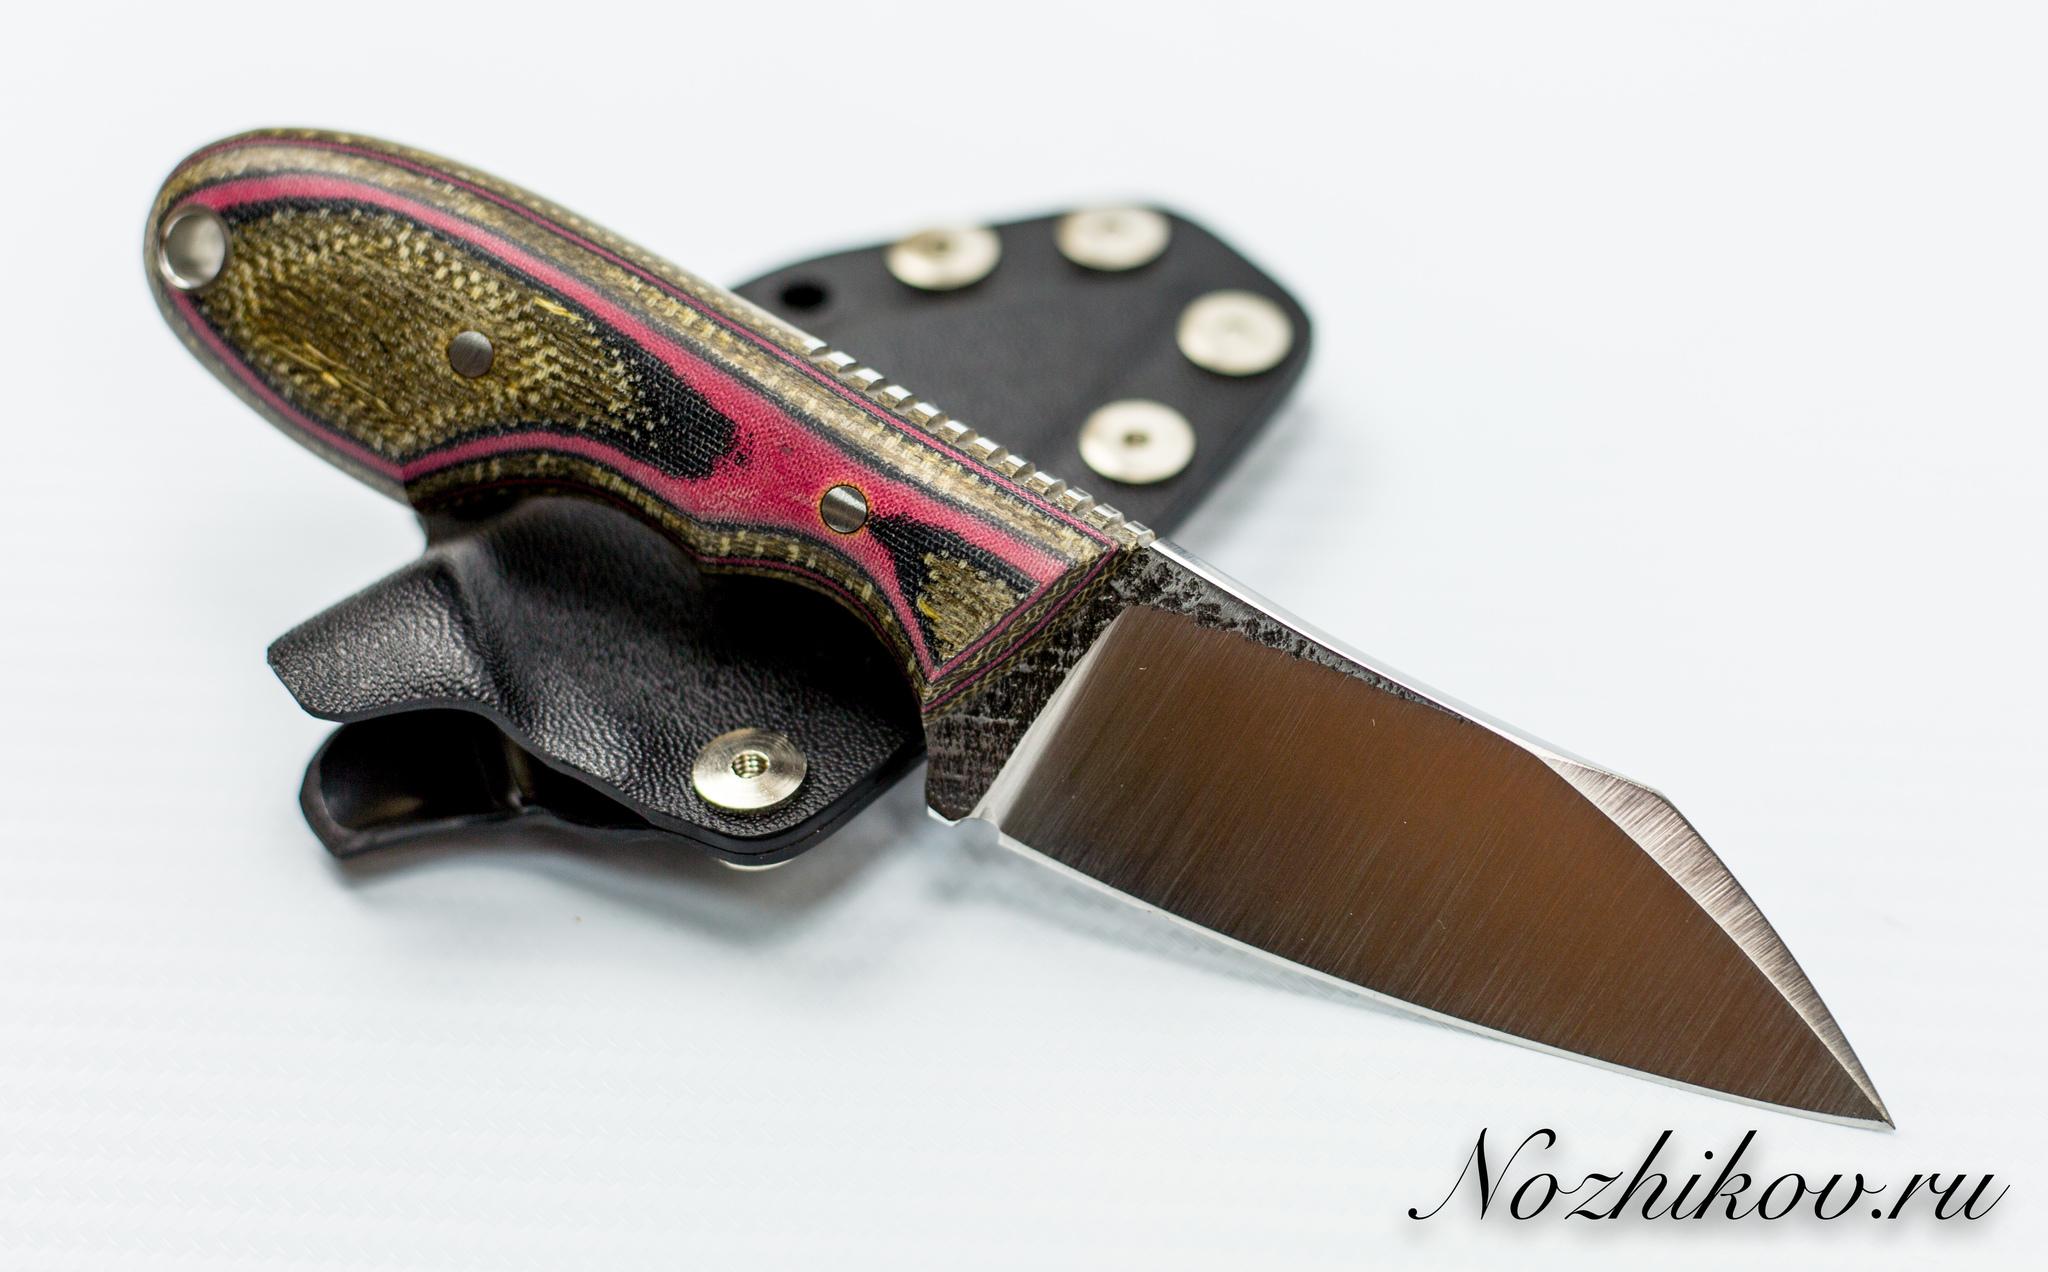 Туристический нож РВС Бонс, сталь Х12МФХ12МФ<br><br>